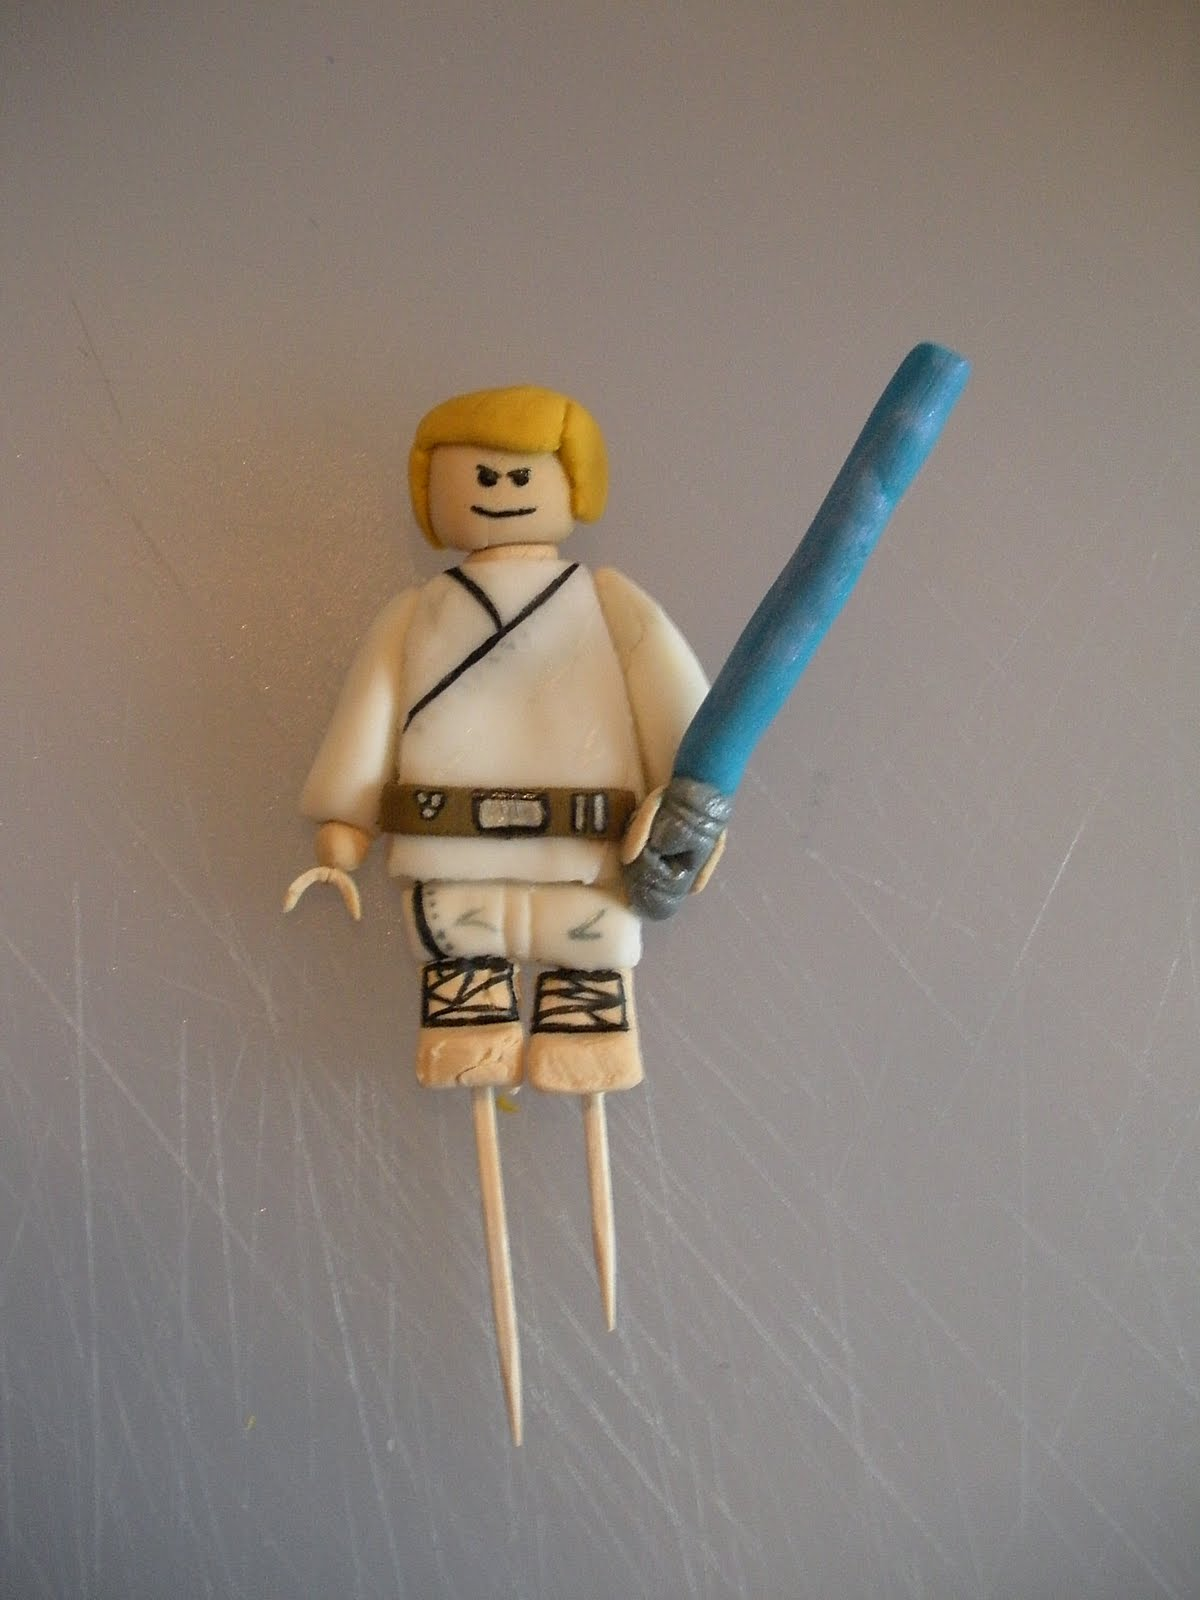 Beachy Cakes Lego Star Wars Amp Girly Cake